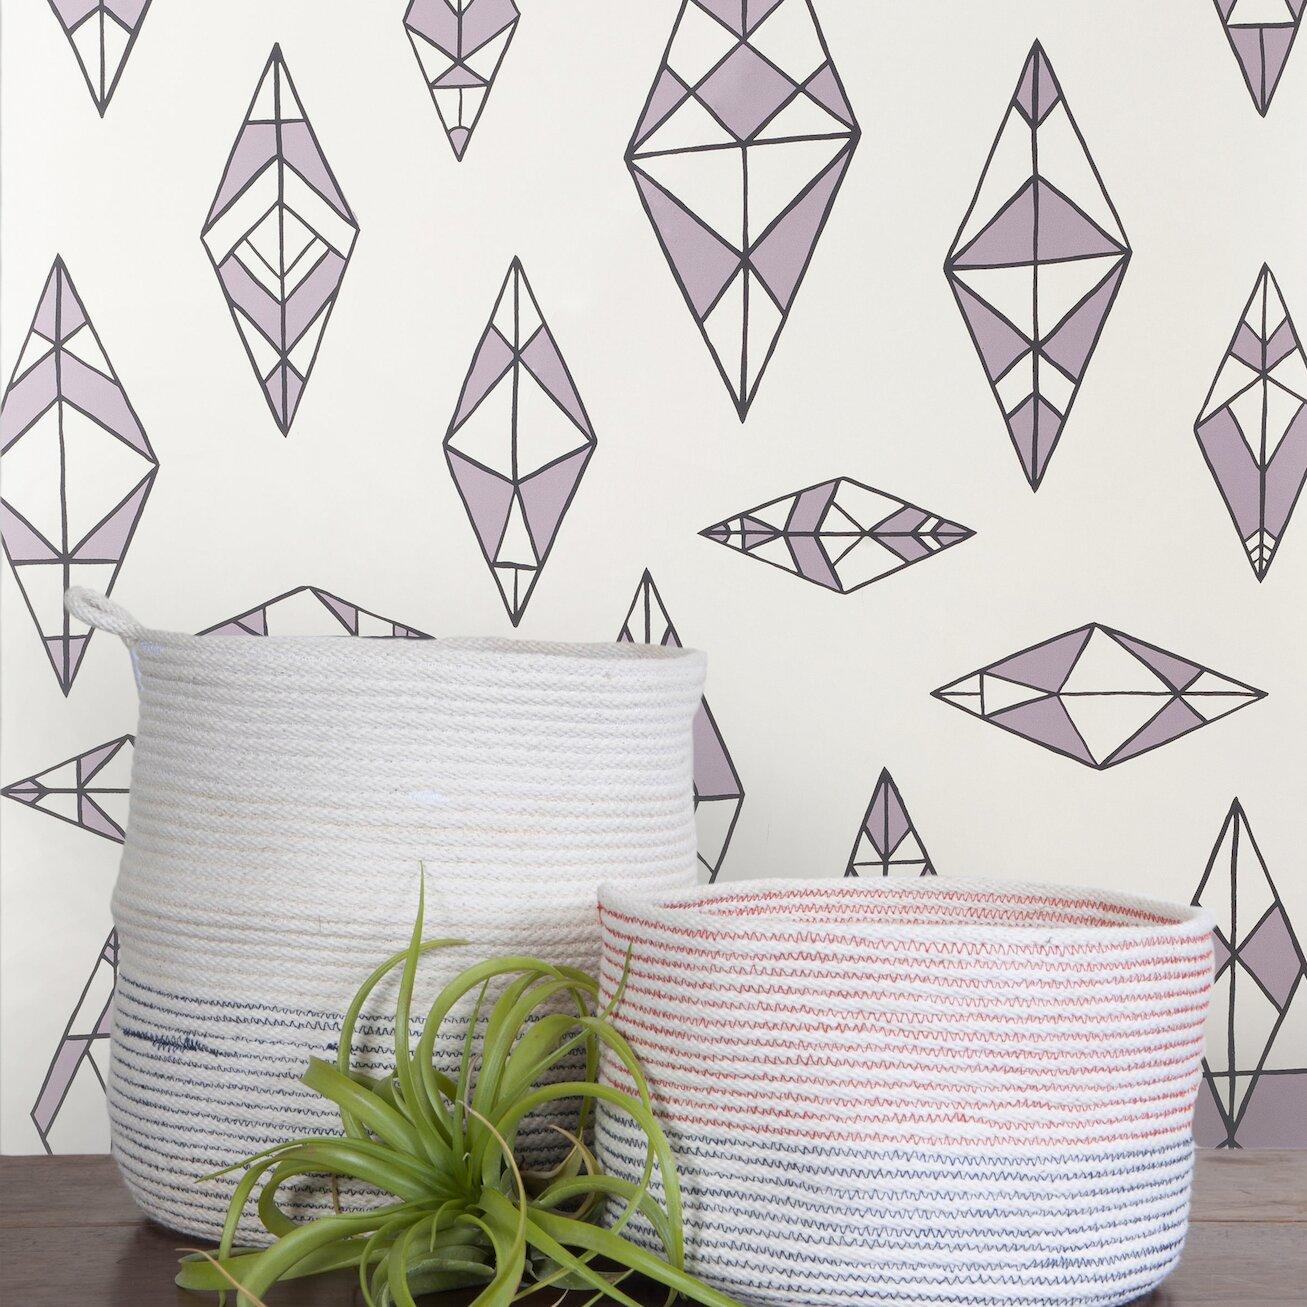 juju papers indian summer 15 39 x 27 wallpaper roll. Black Bedroom Furniture Sets. Home Design Ideas